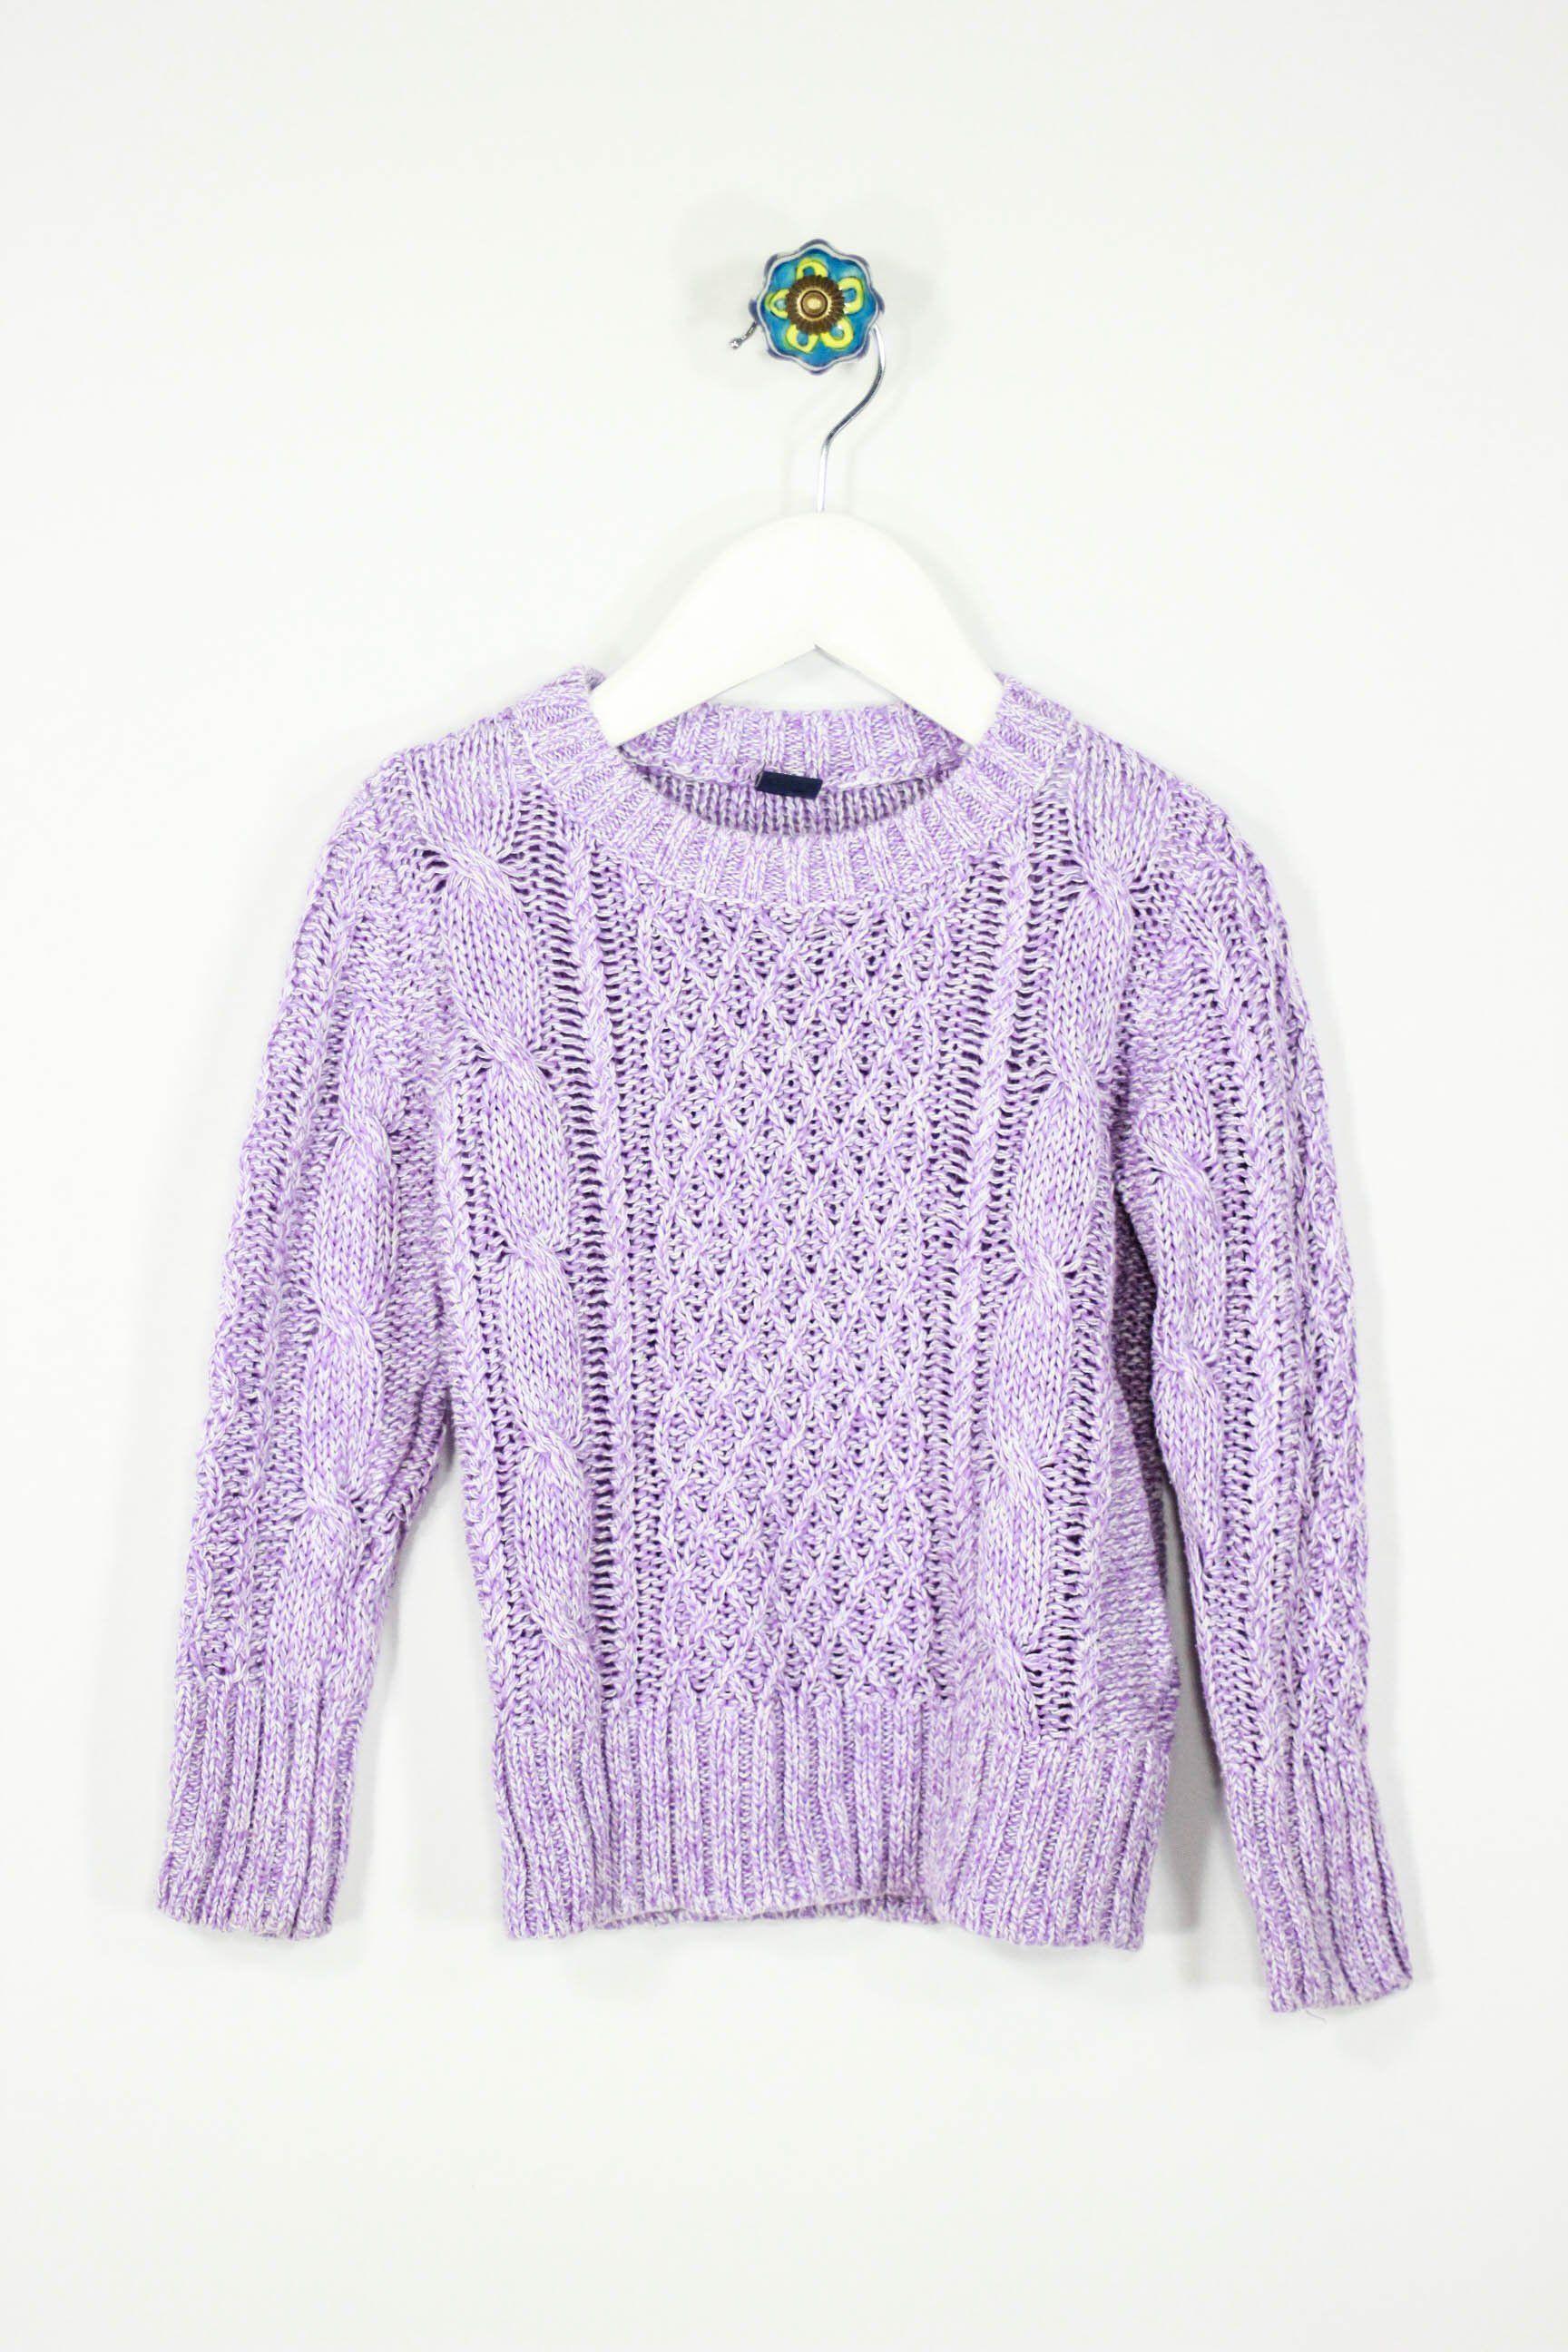 61508f764 Baby Gap Size 4 Purple Sweater